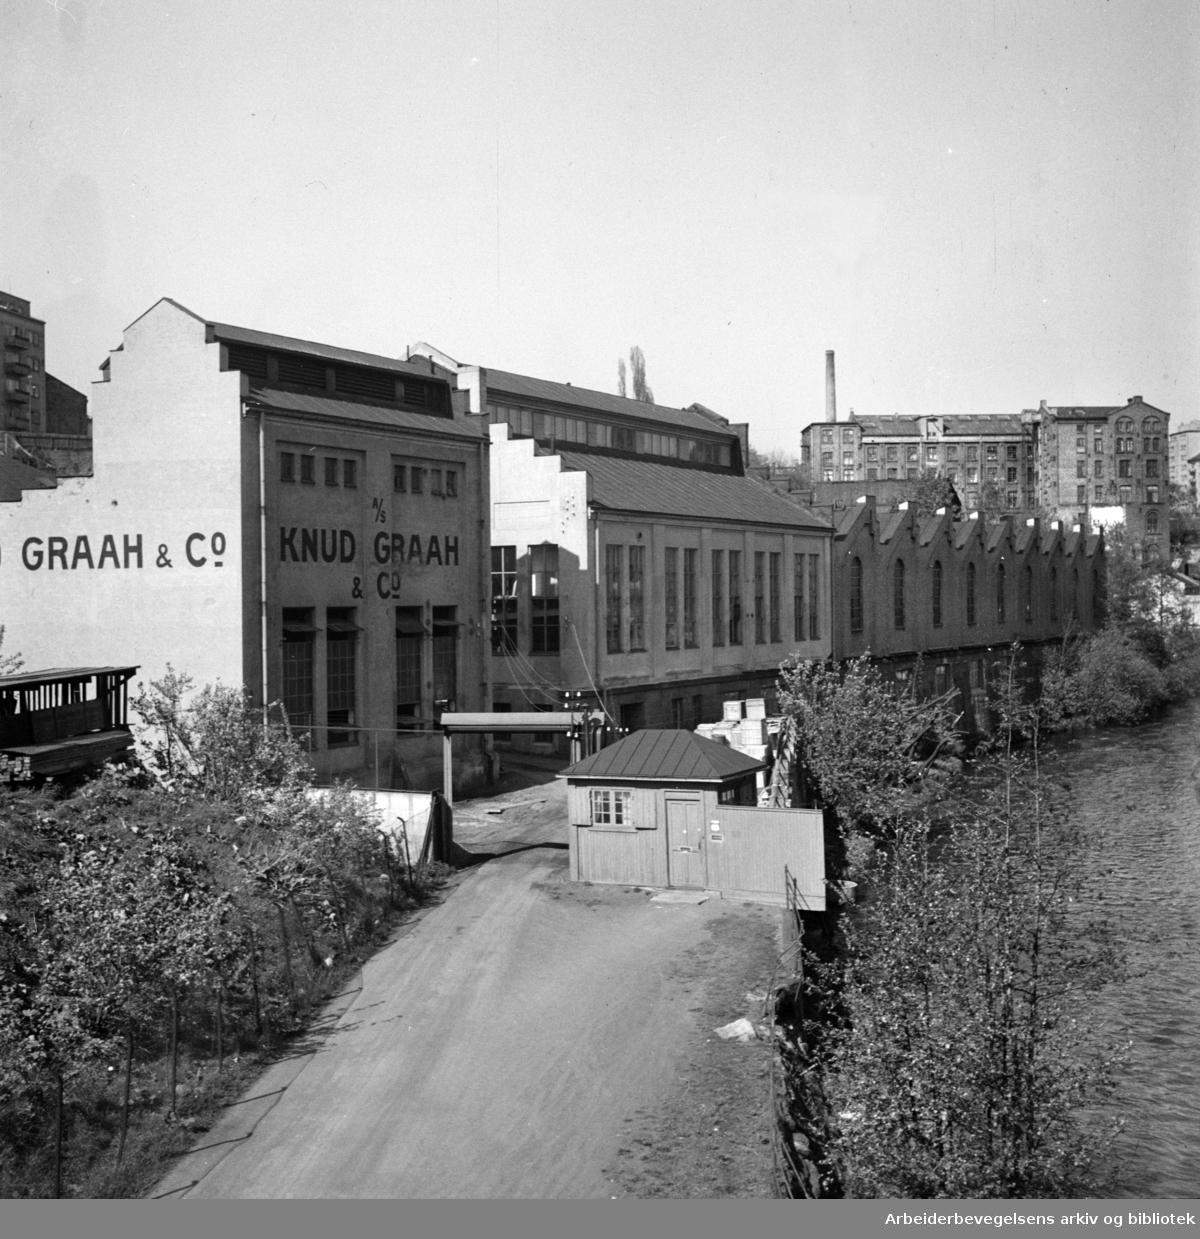 Akerselva. Fabrikker og industri langs elva. Knud Graahs fabrikker. 1949